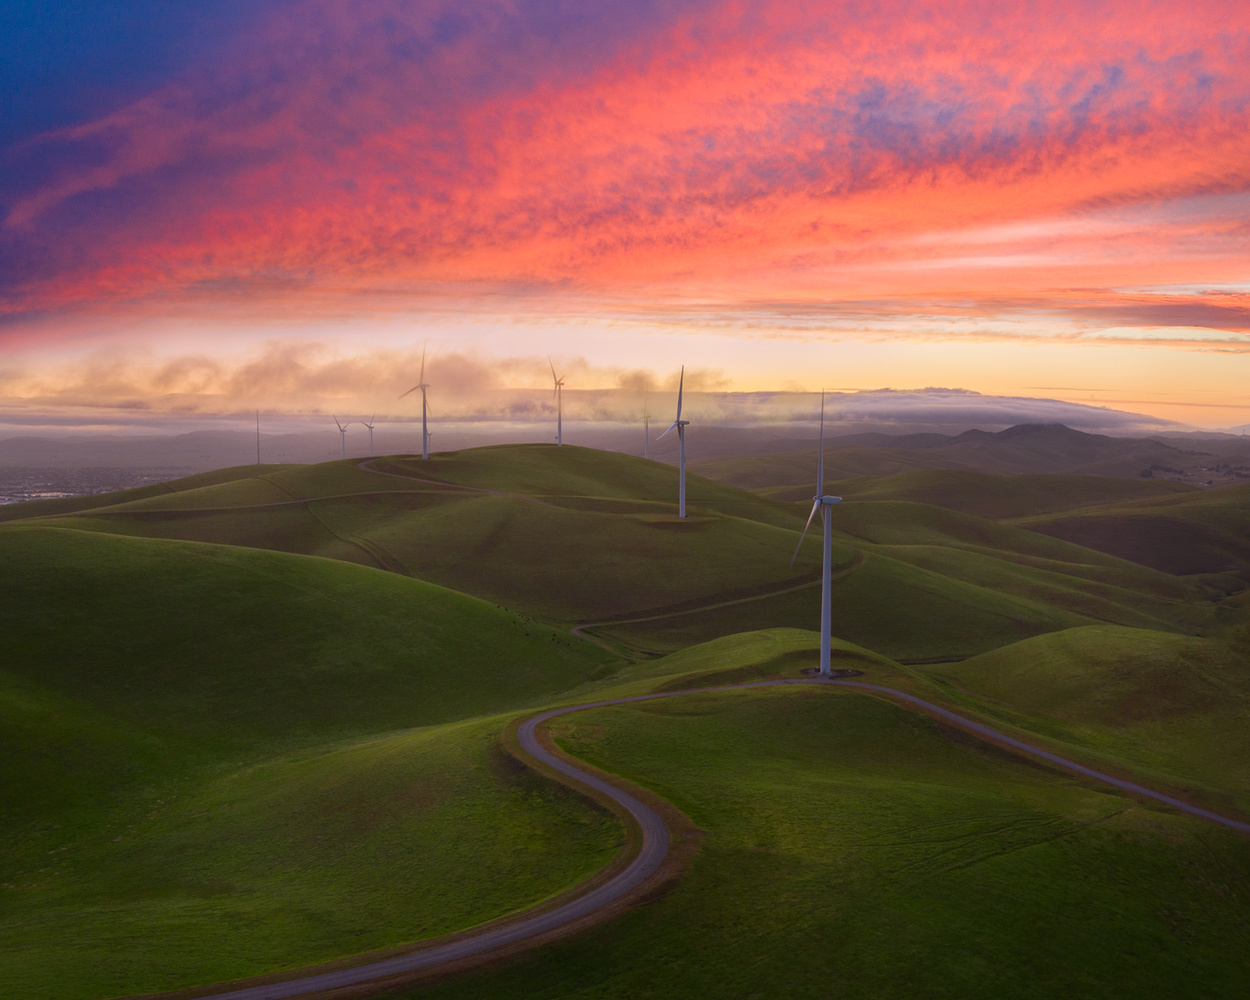 Windmills with fiery sky by Ryan Fitzsimons